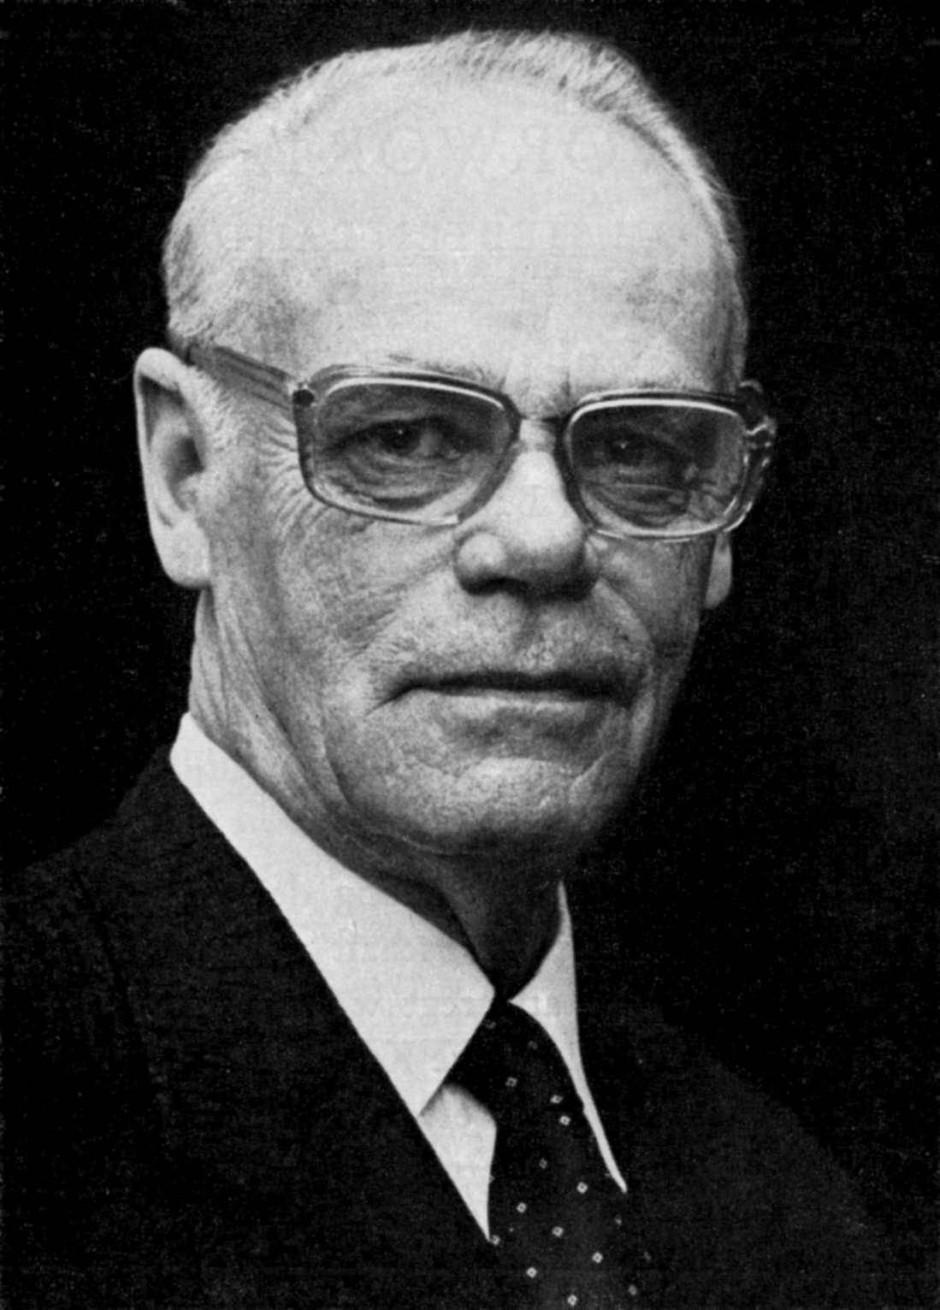 Der Schüler: Ludwig Heynrich Heidenreich